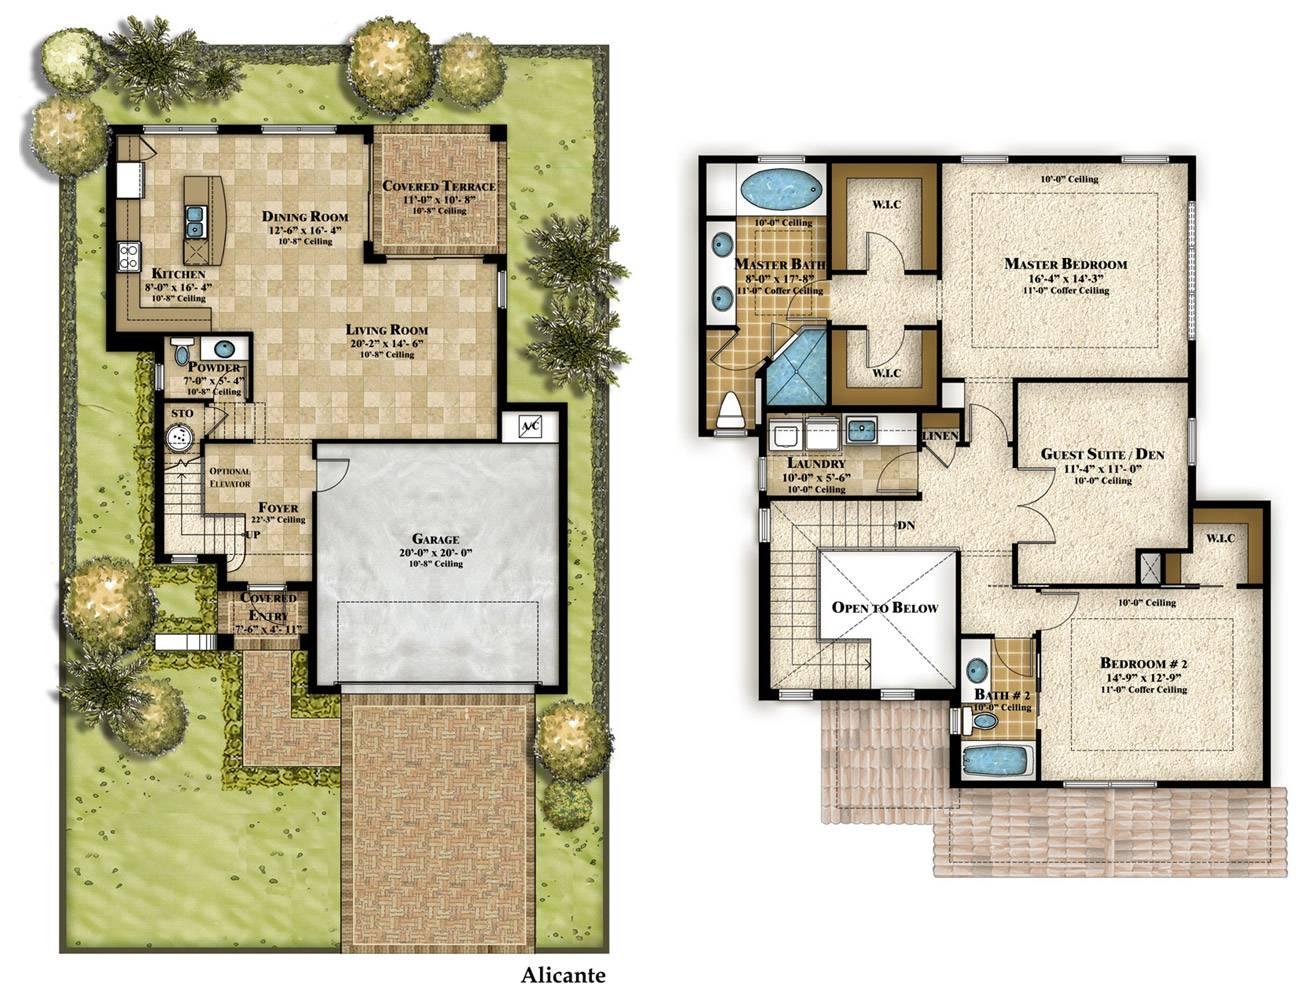 House Storey Minimalist Design Best Small Plans House Plans 163256